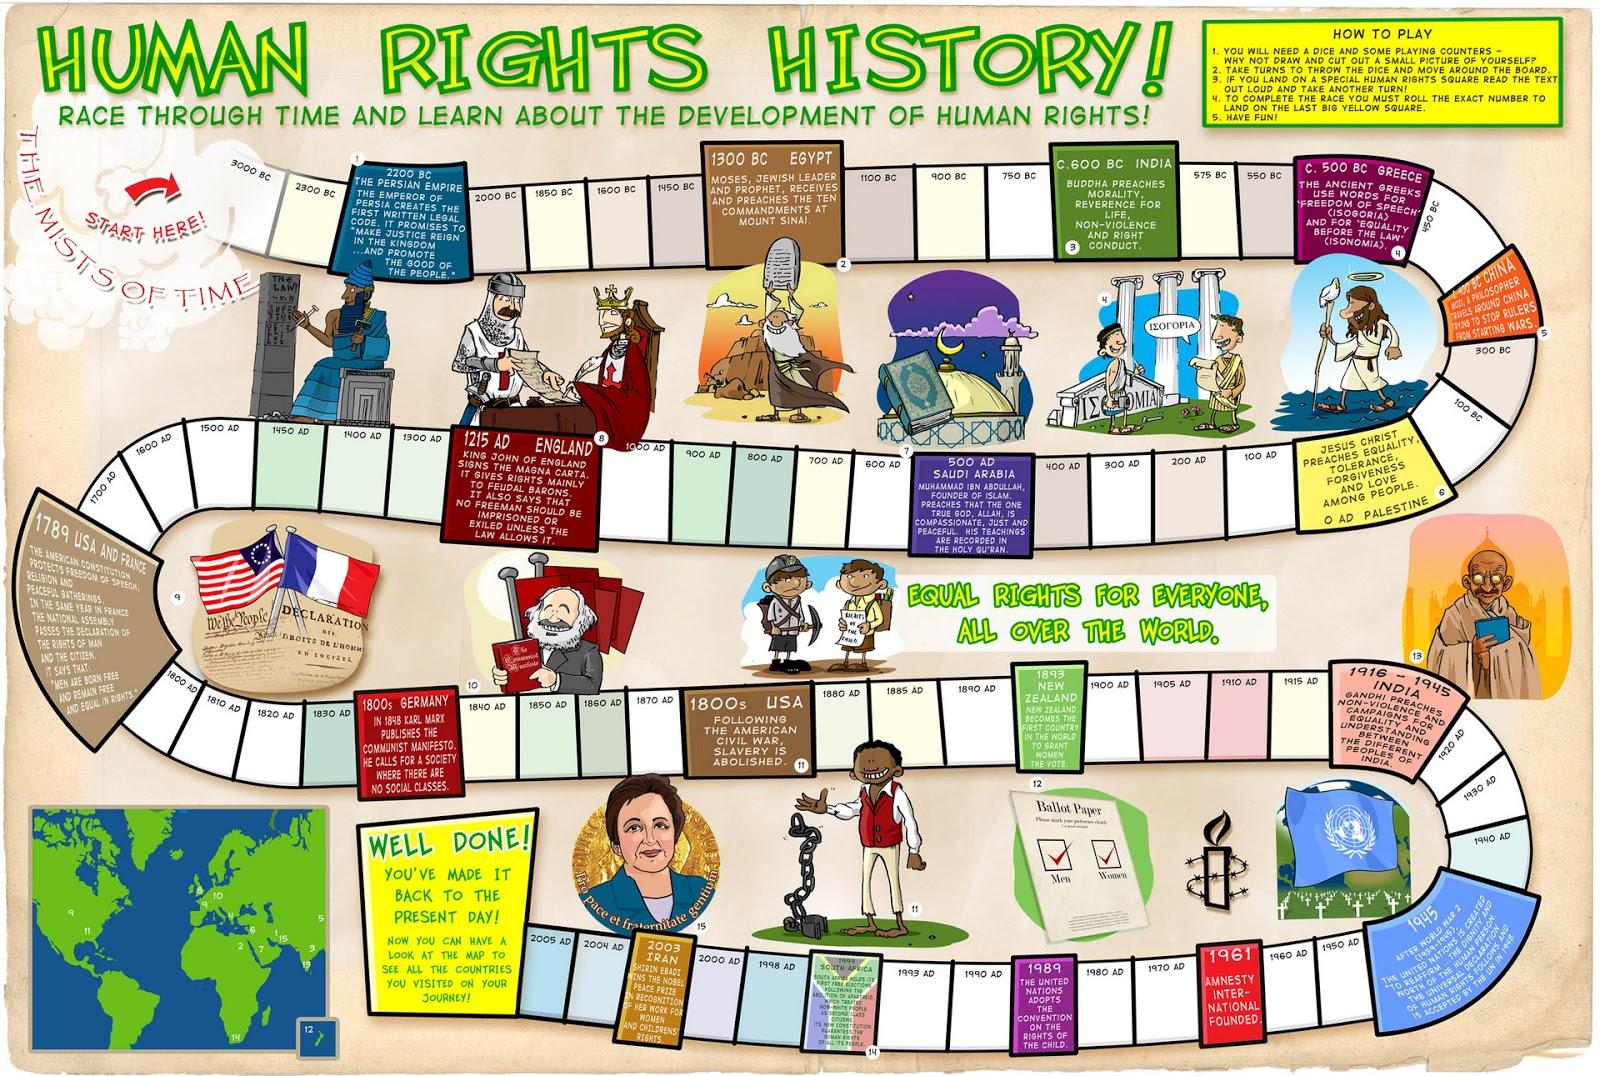 December 10th - International Human Rights Day